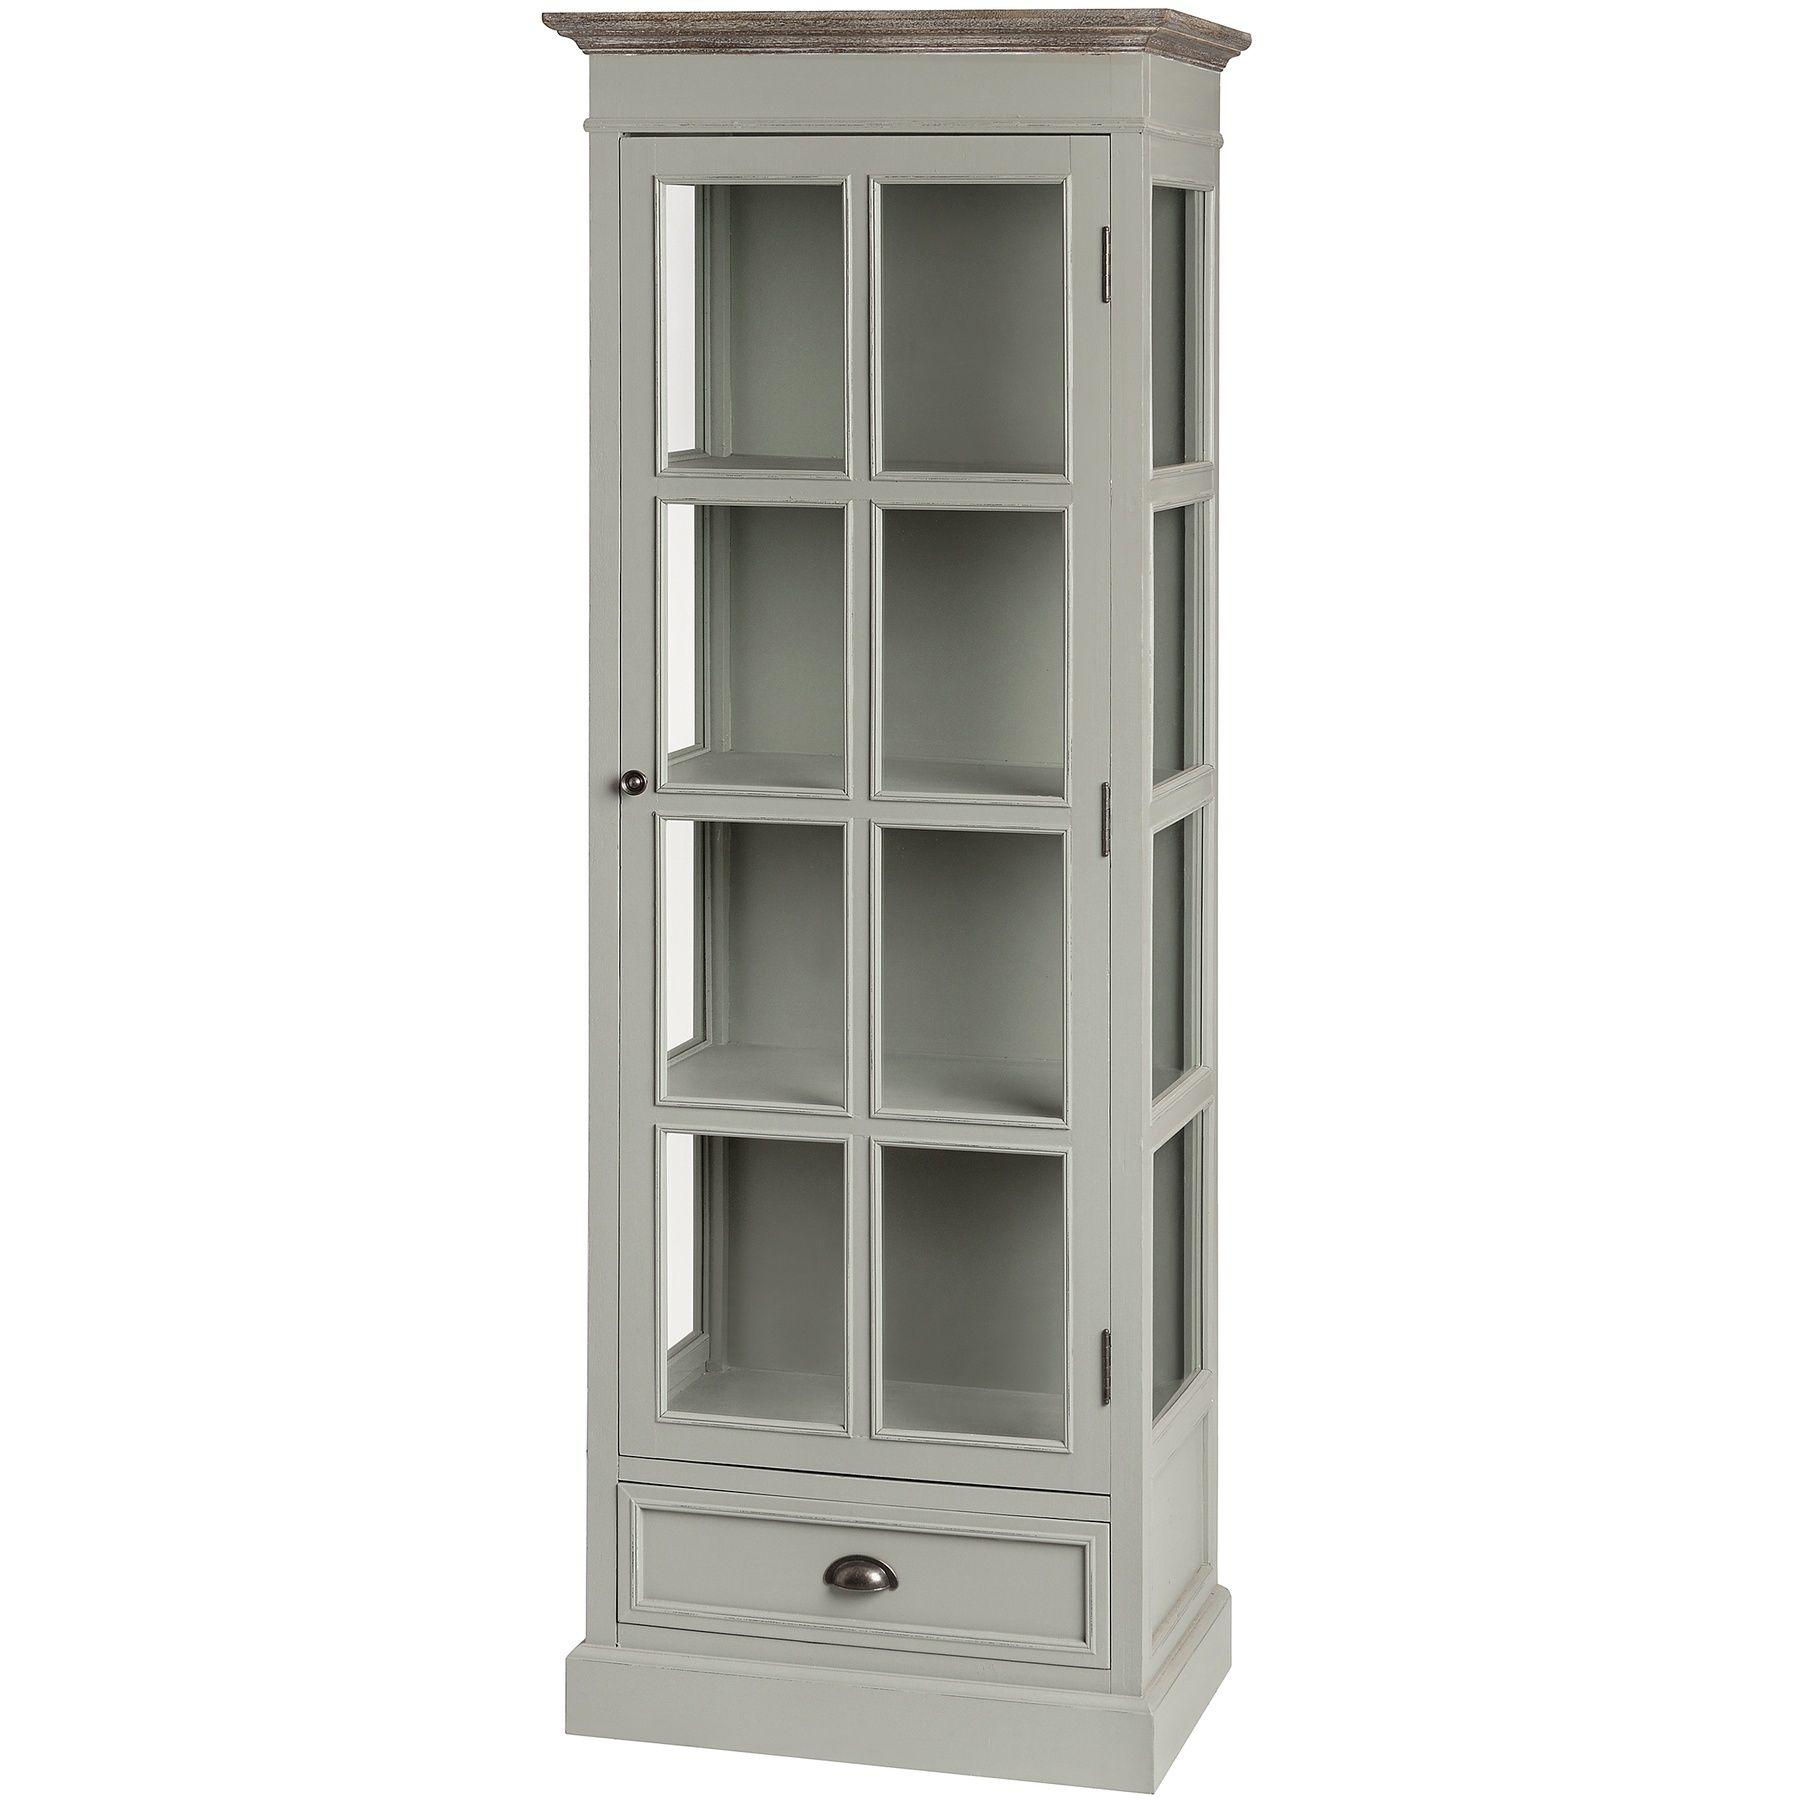 New Lyon Tall Glazed Display Cabinet